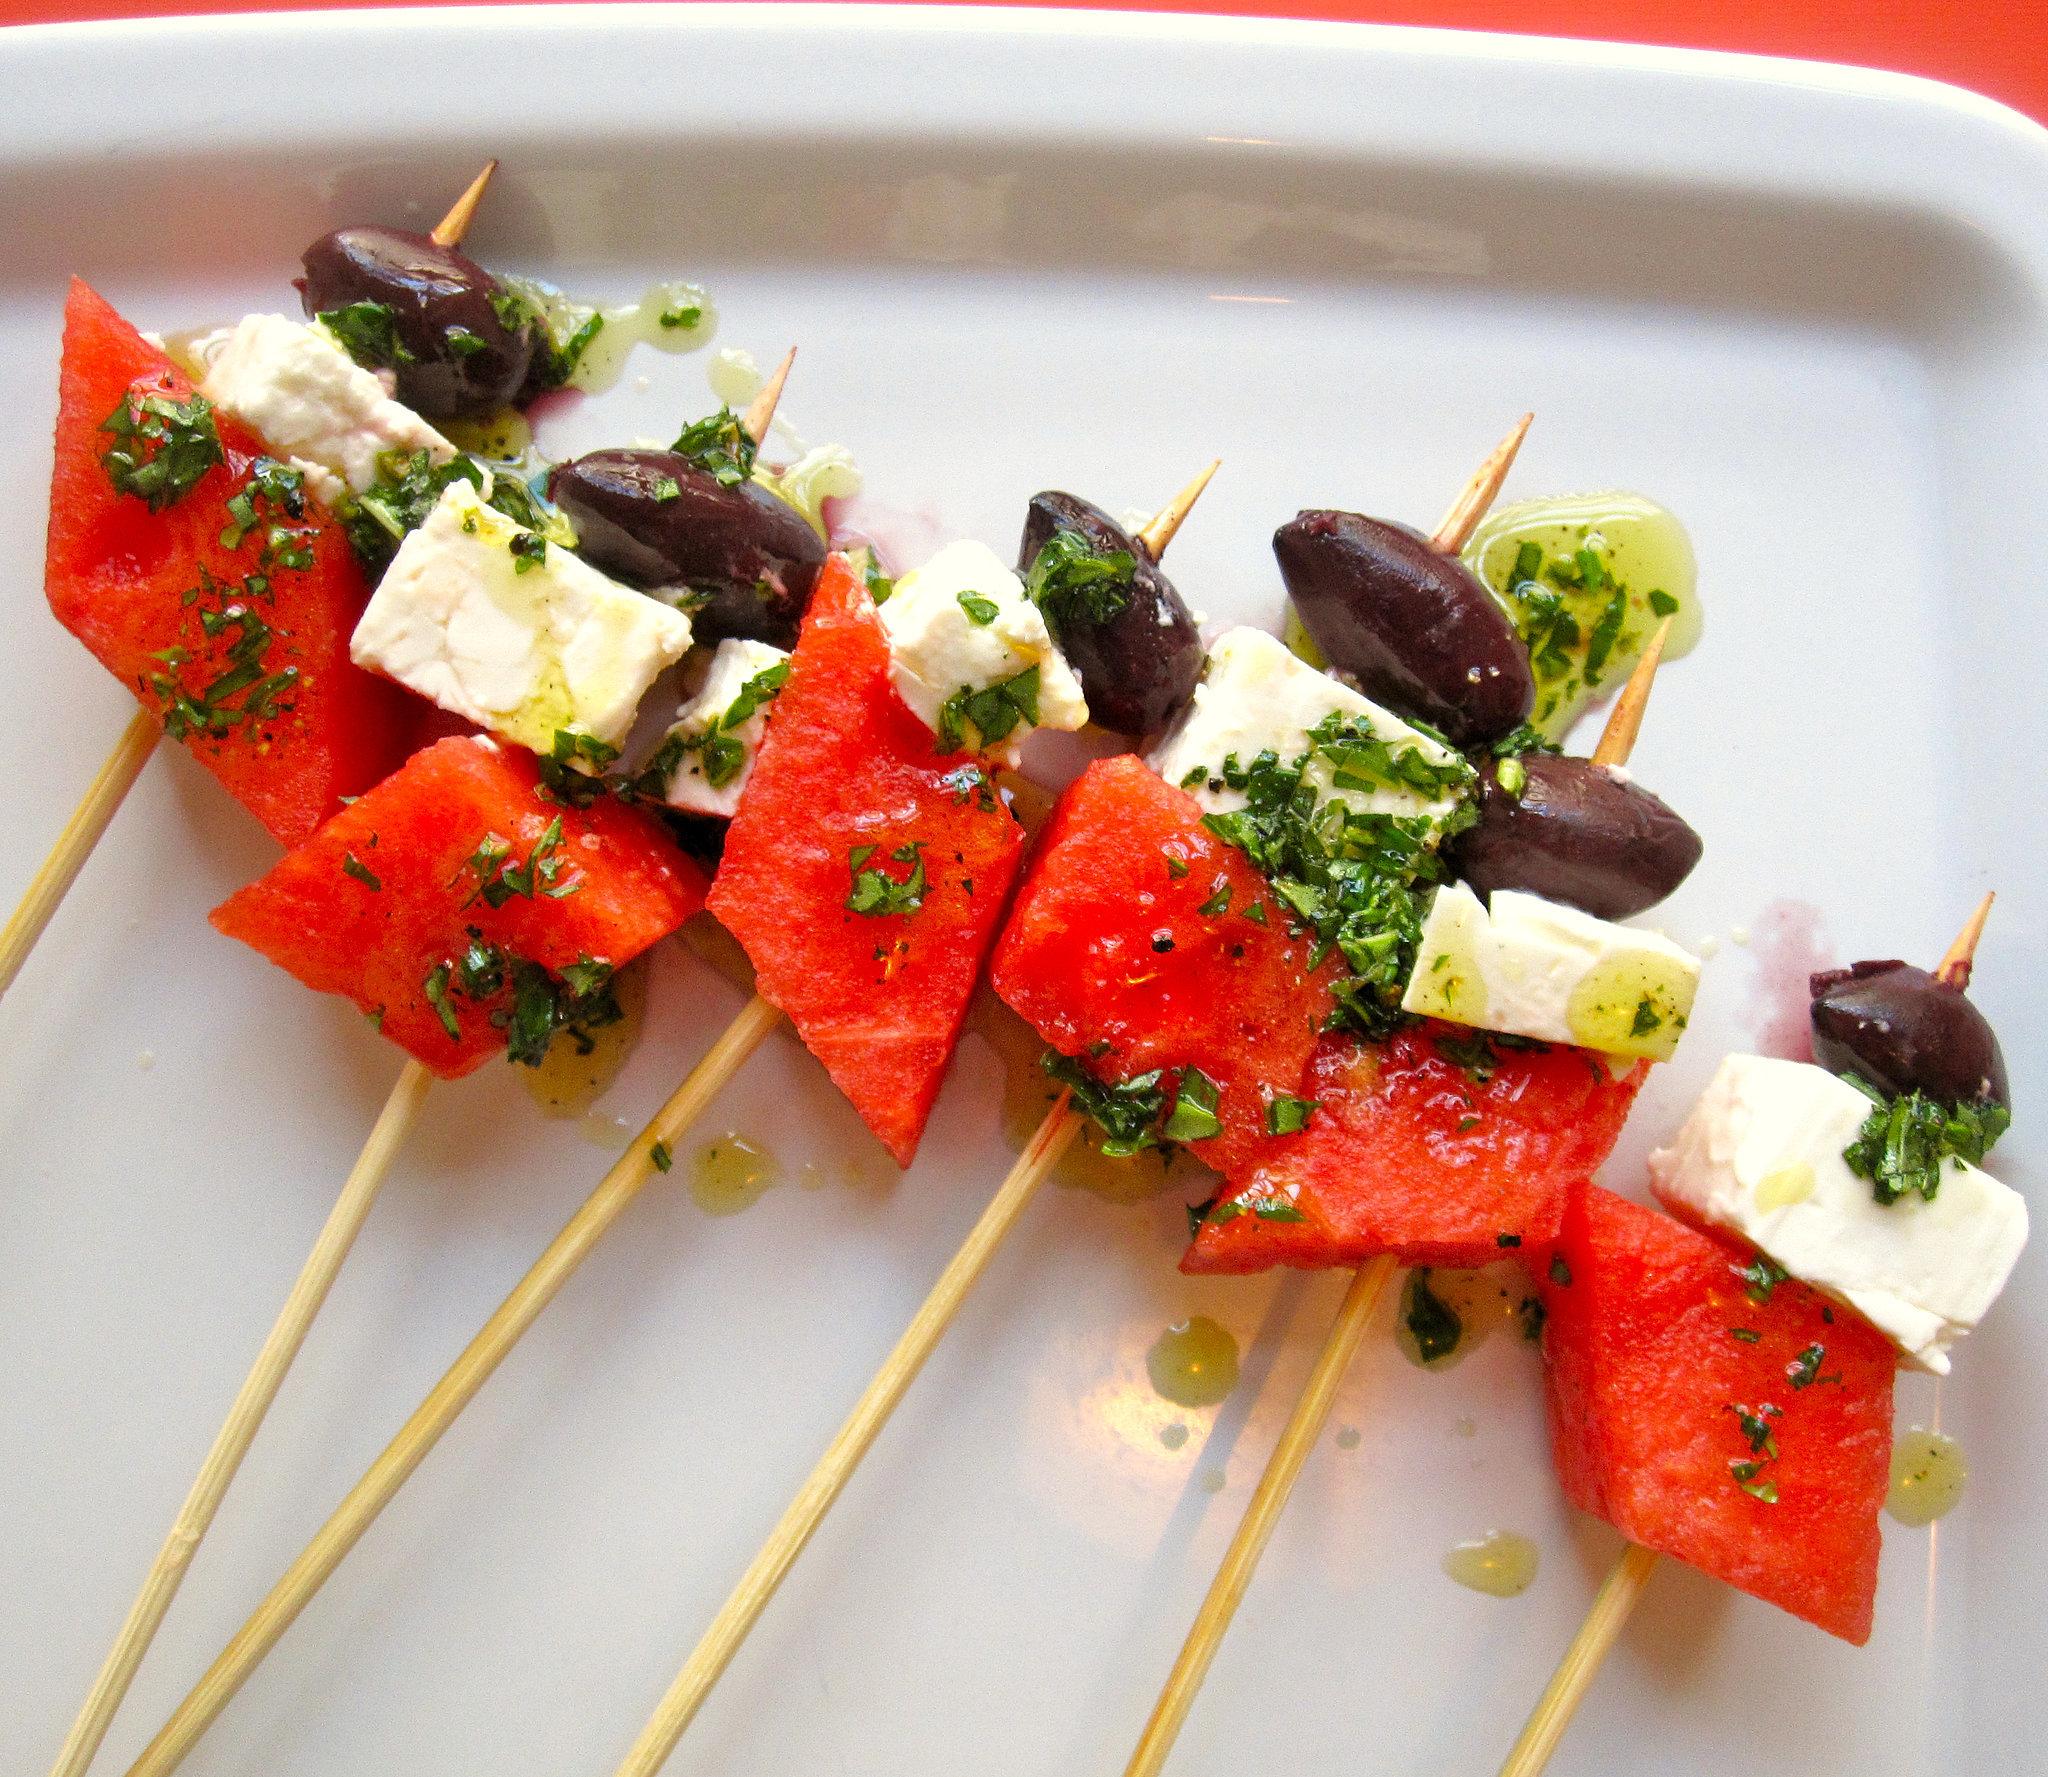 Watermelon, Feta, and Olive Skewers